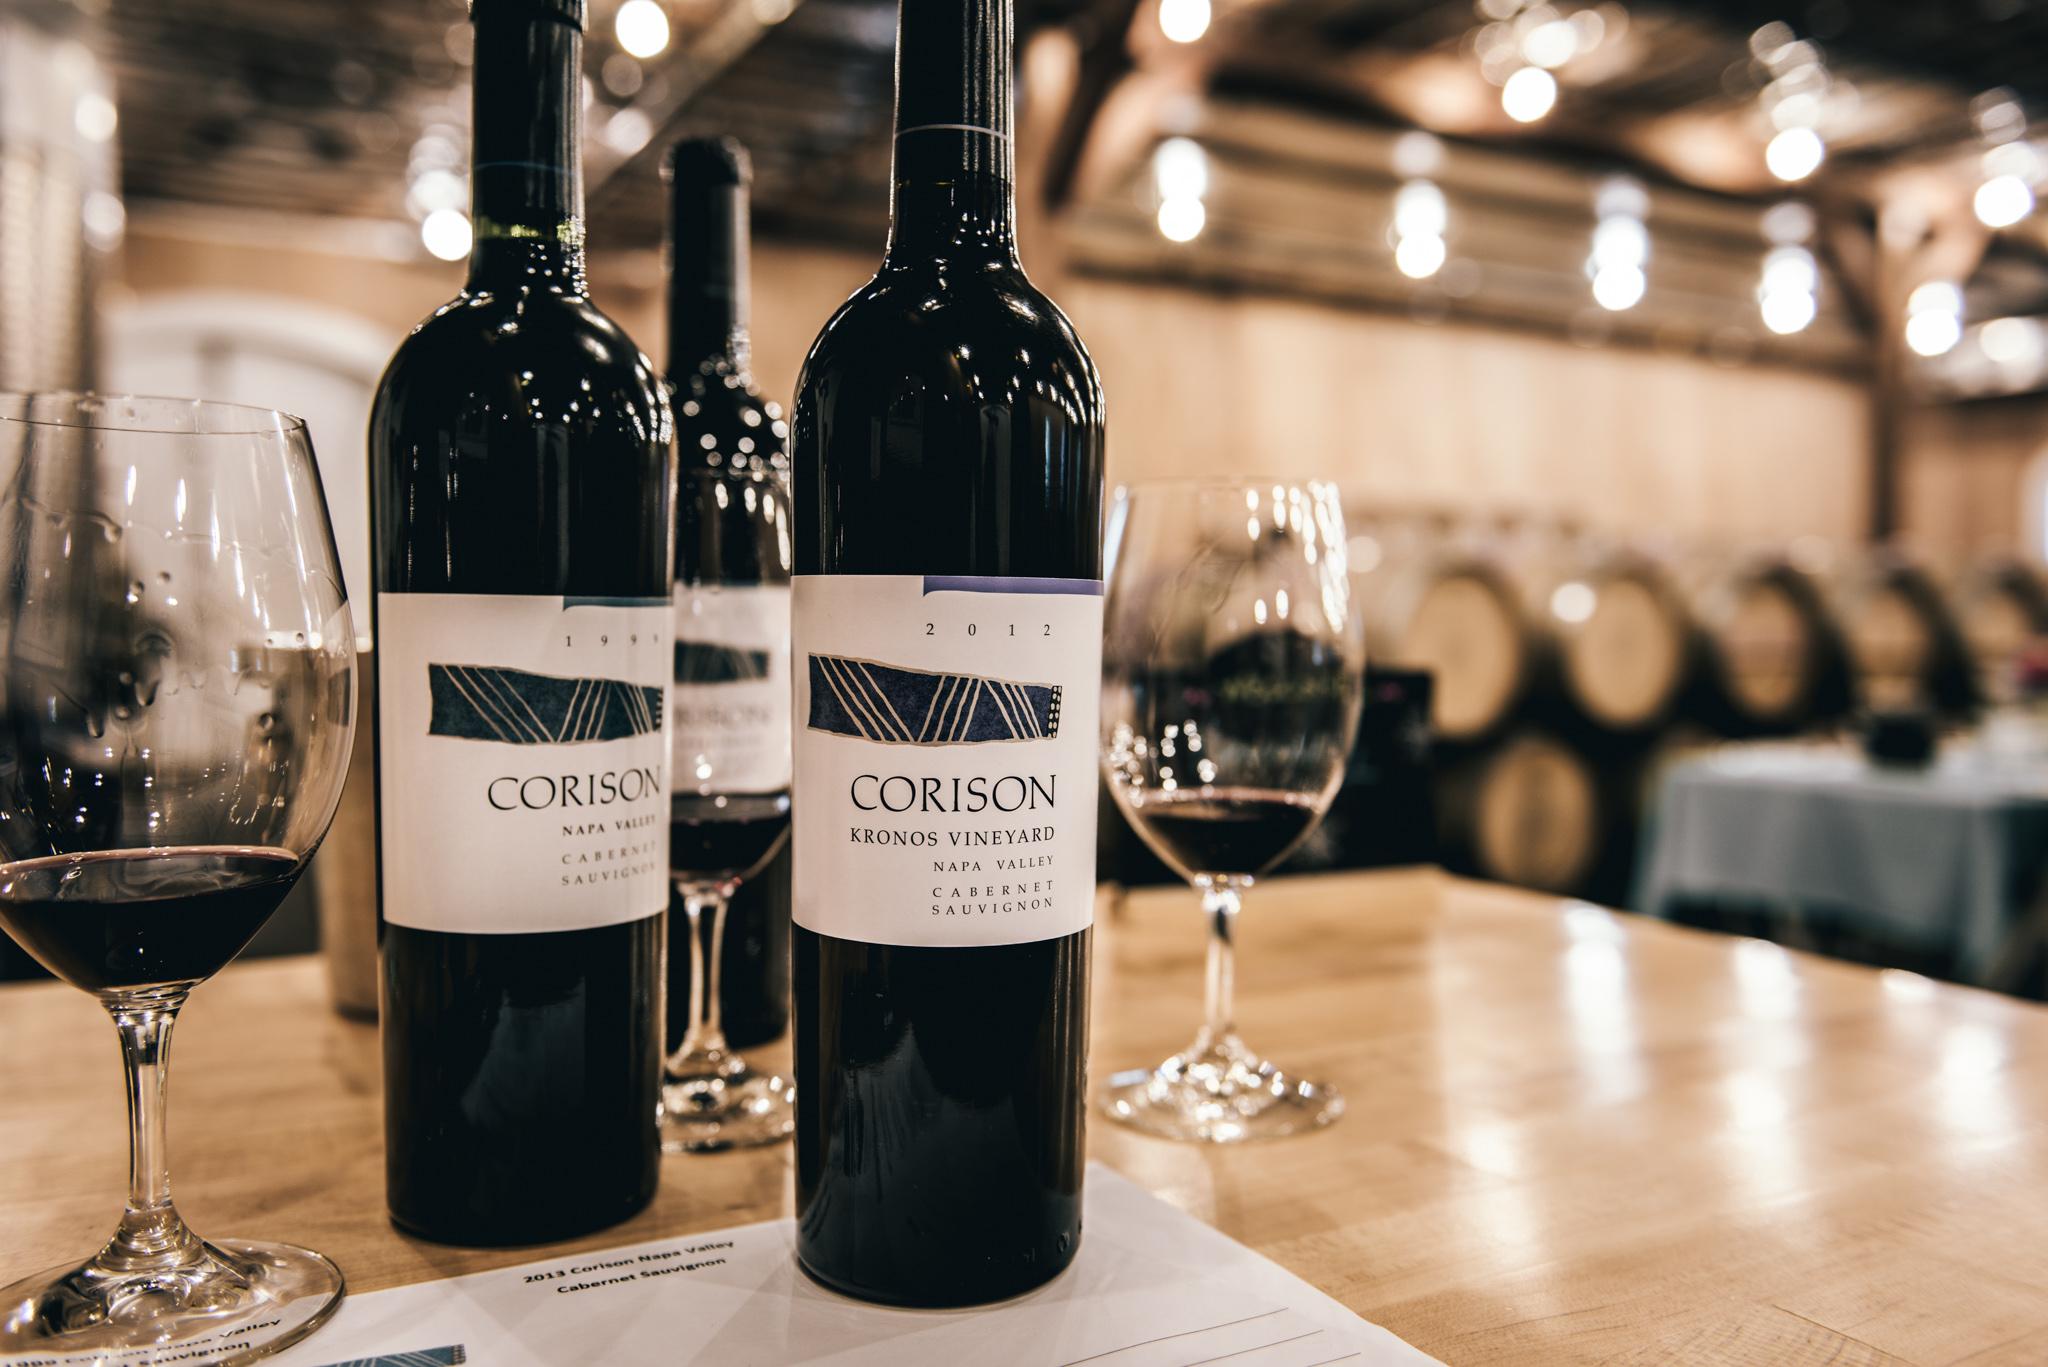 California : Napa Valley : Tasting at Corison in St. Helena